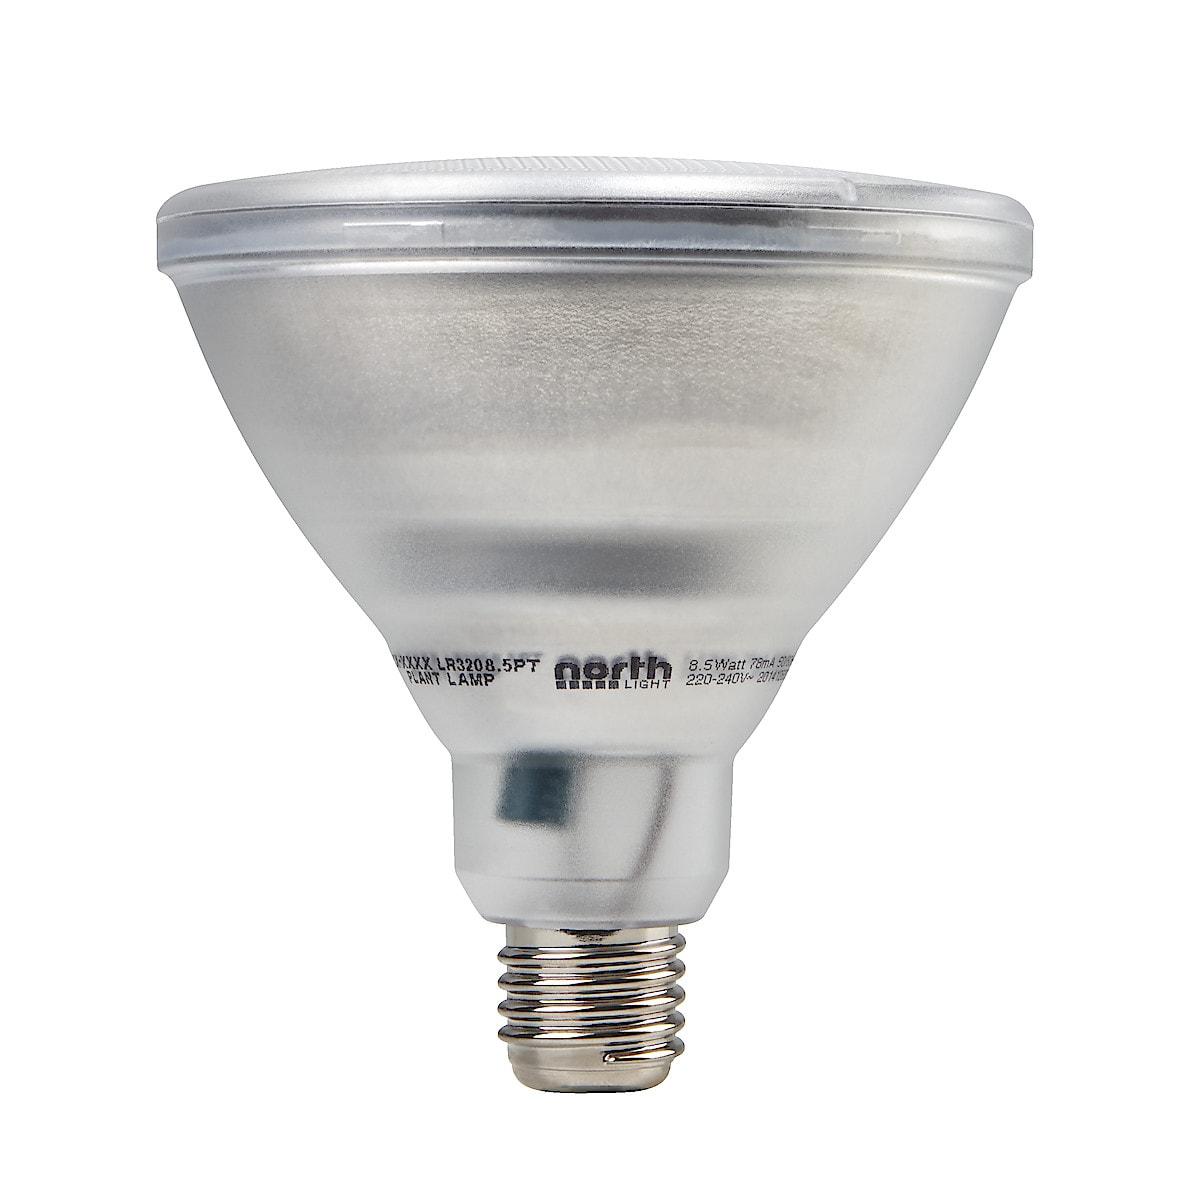 Växtlampa LED E27 PAR38